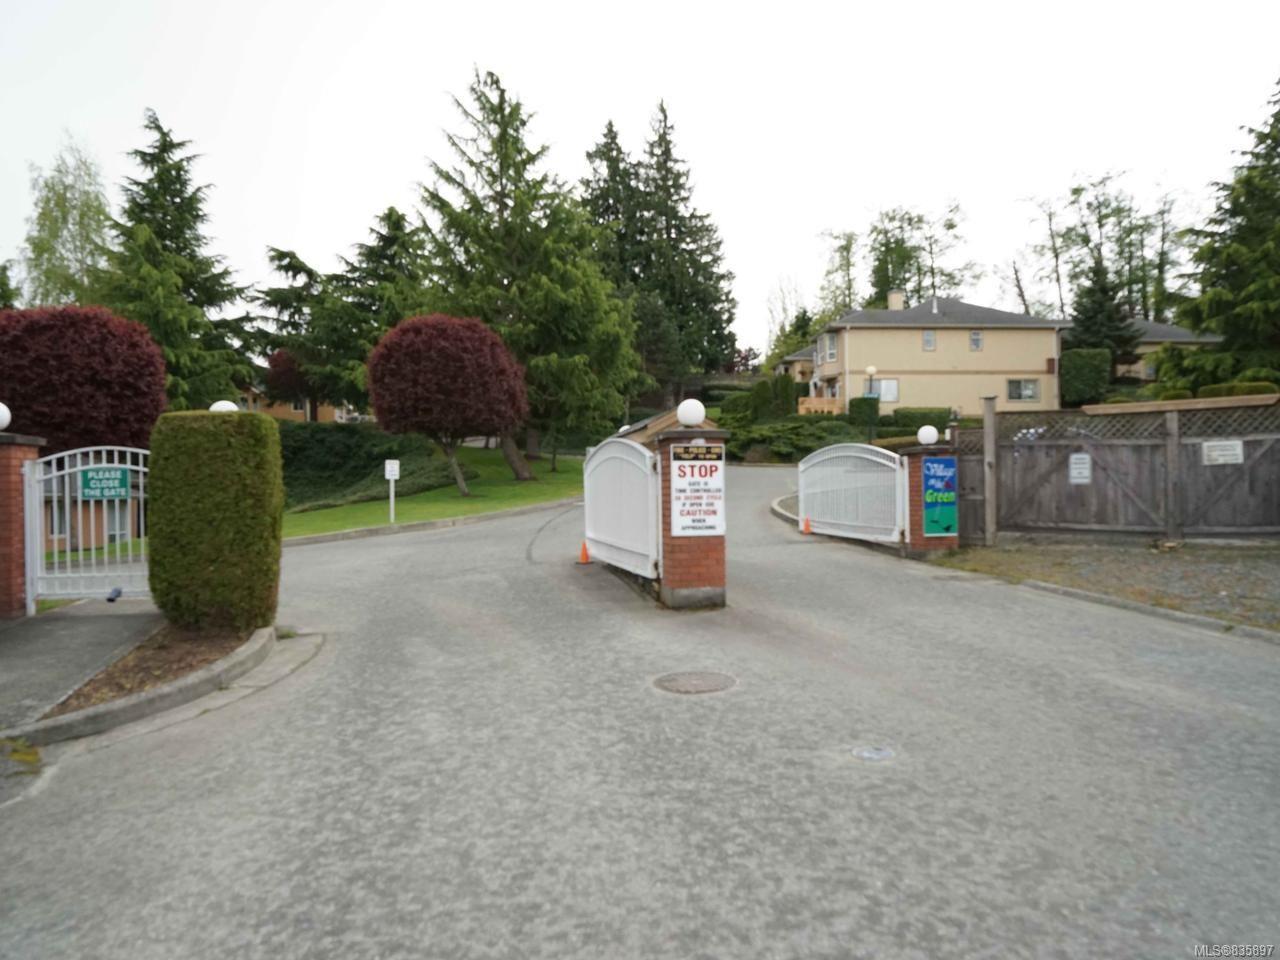 Photo 8: Photos: 2024 Mulligan Way in NANAIMO: Na Departure Bay Row/Townhouse for sale (Nanaimo)  : MLS®# 835897